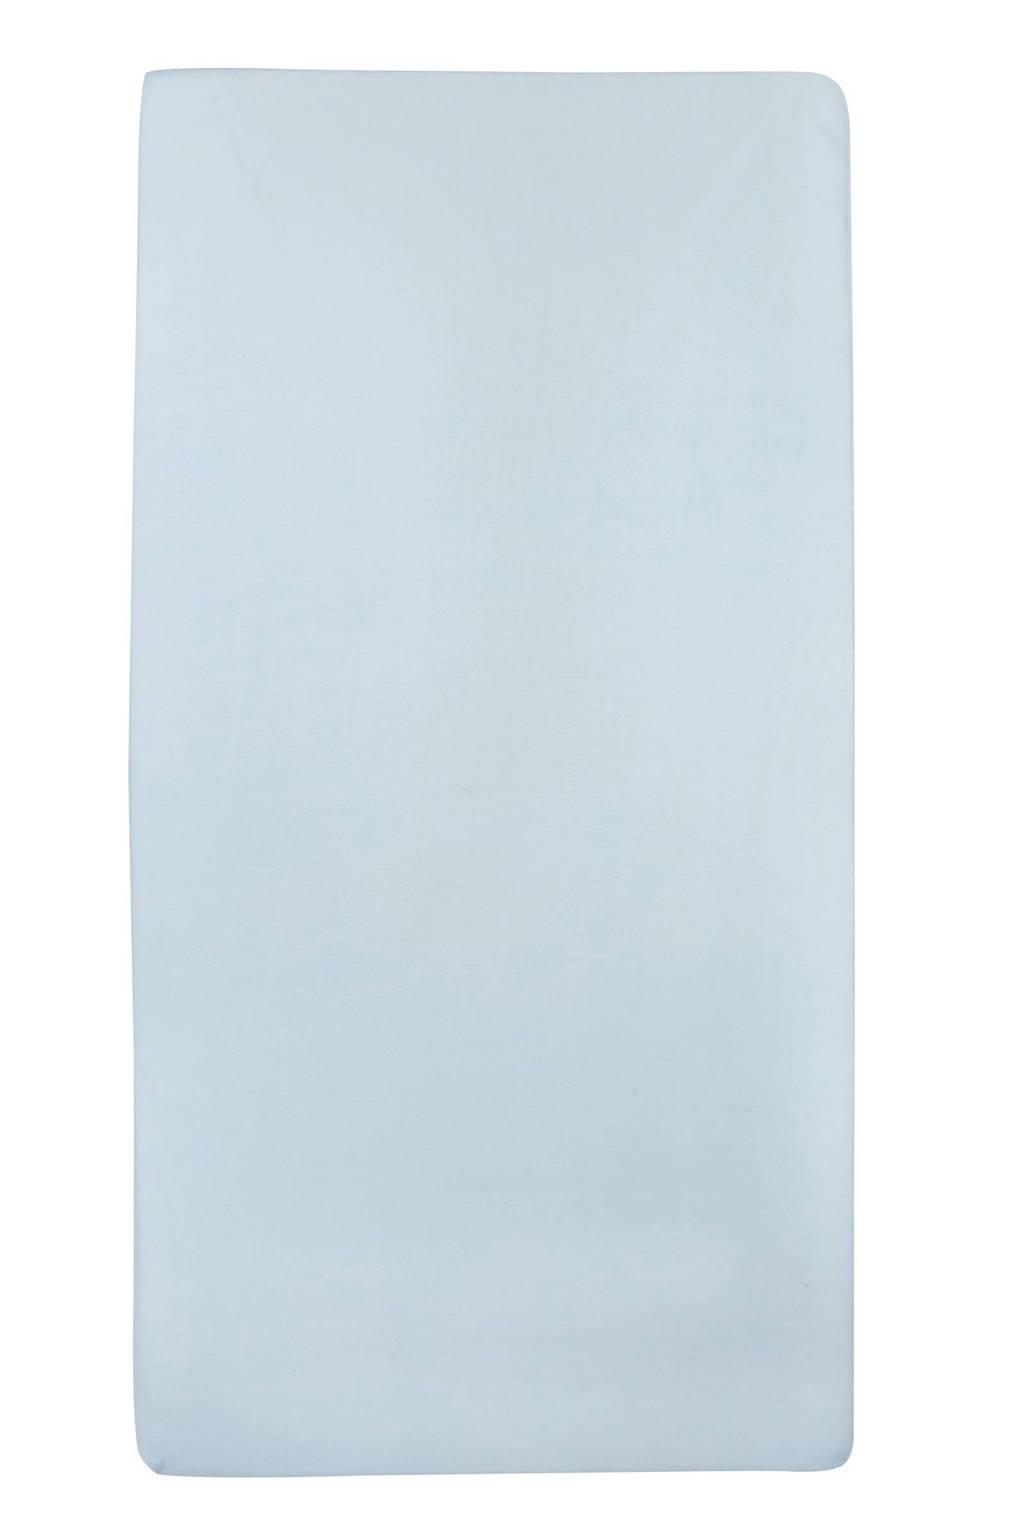 Meyco jersey baby hoeslaken ledikant 60x120 cm Lichtblauw